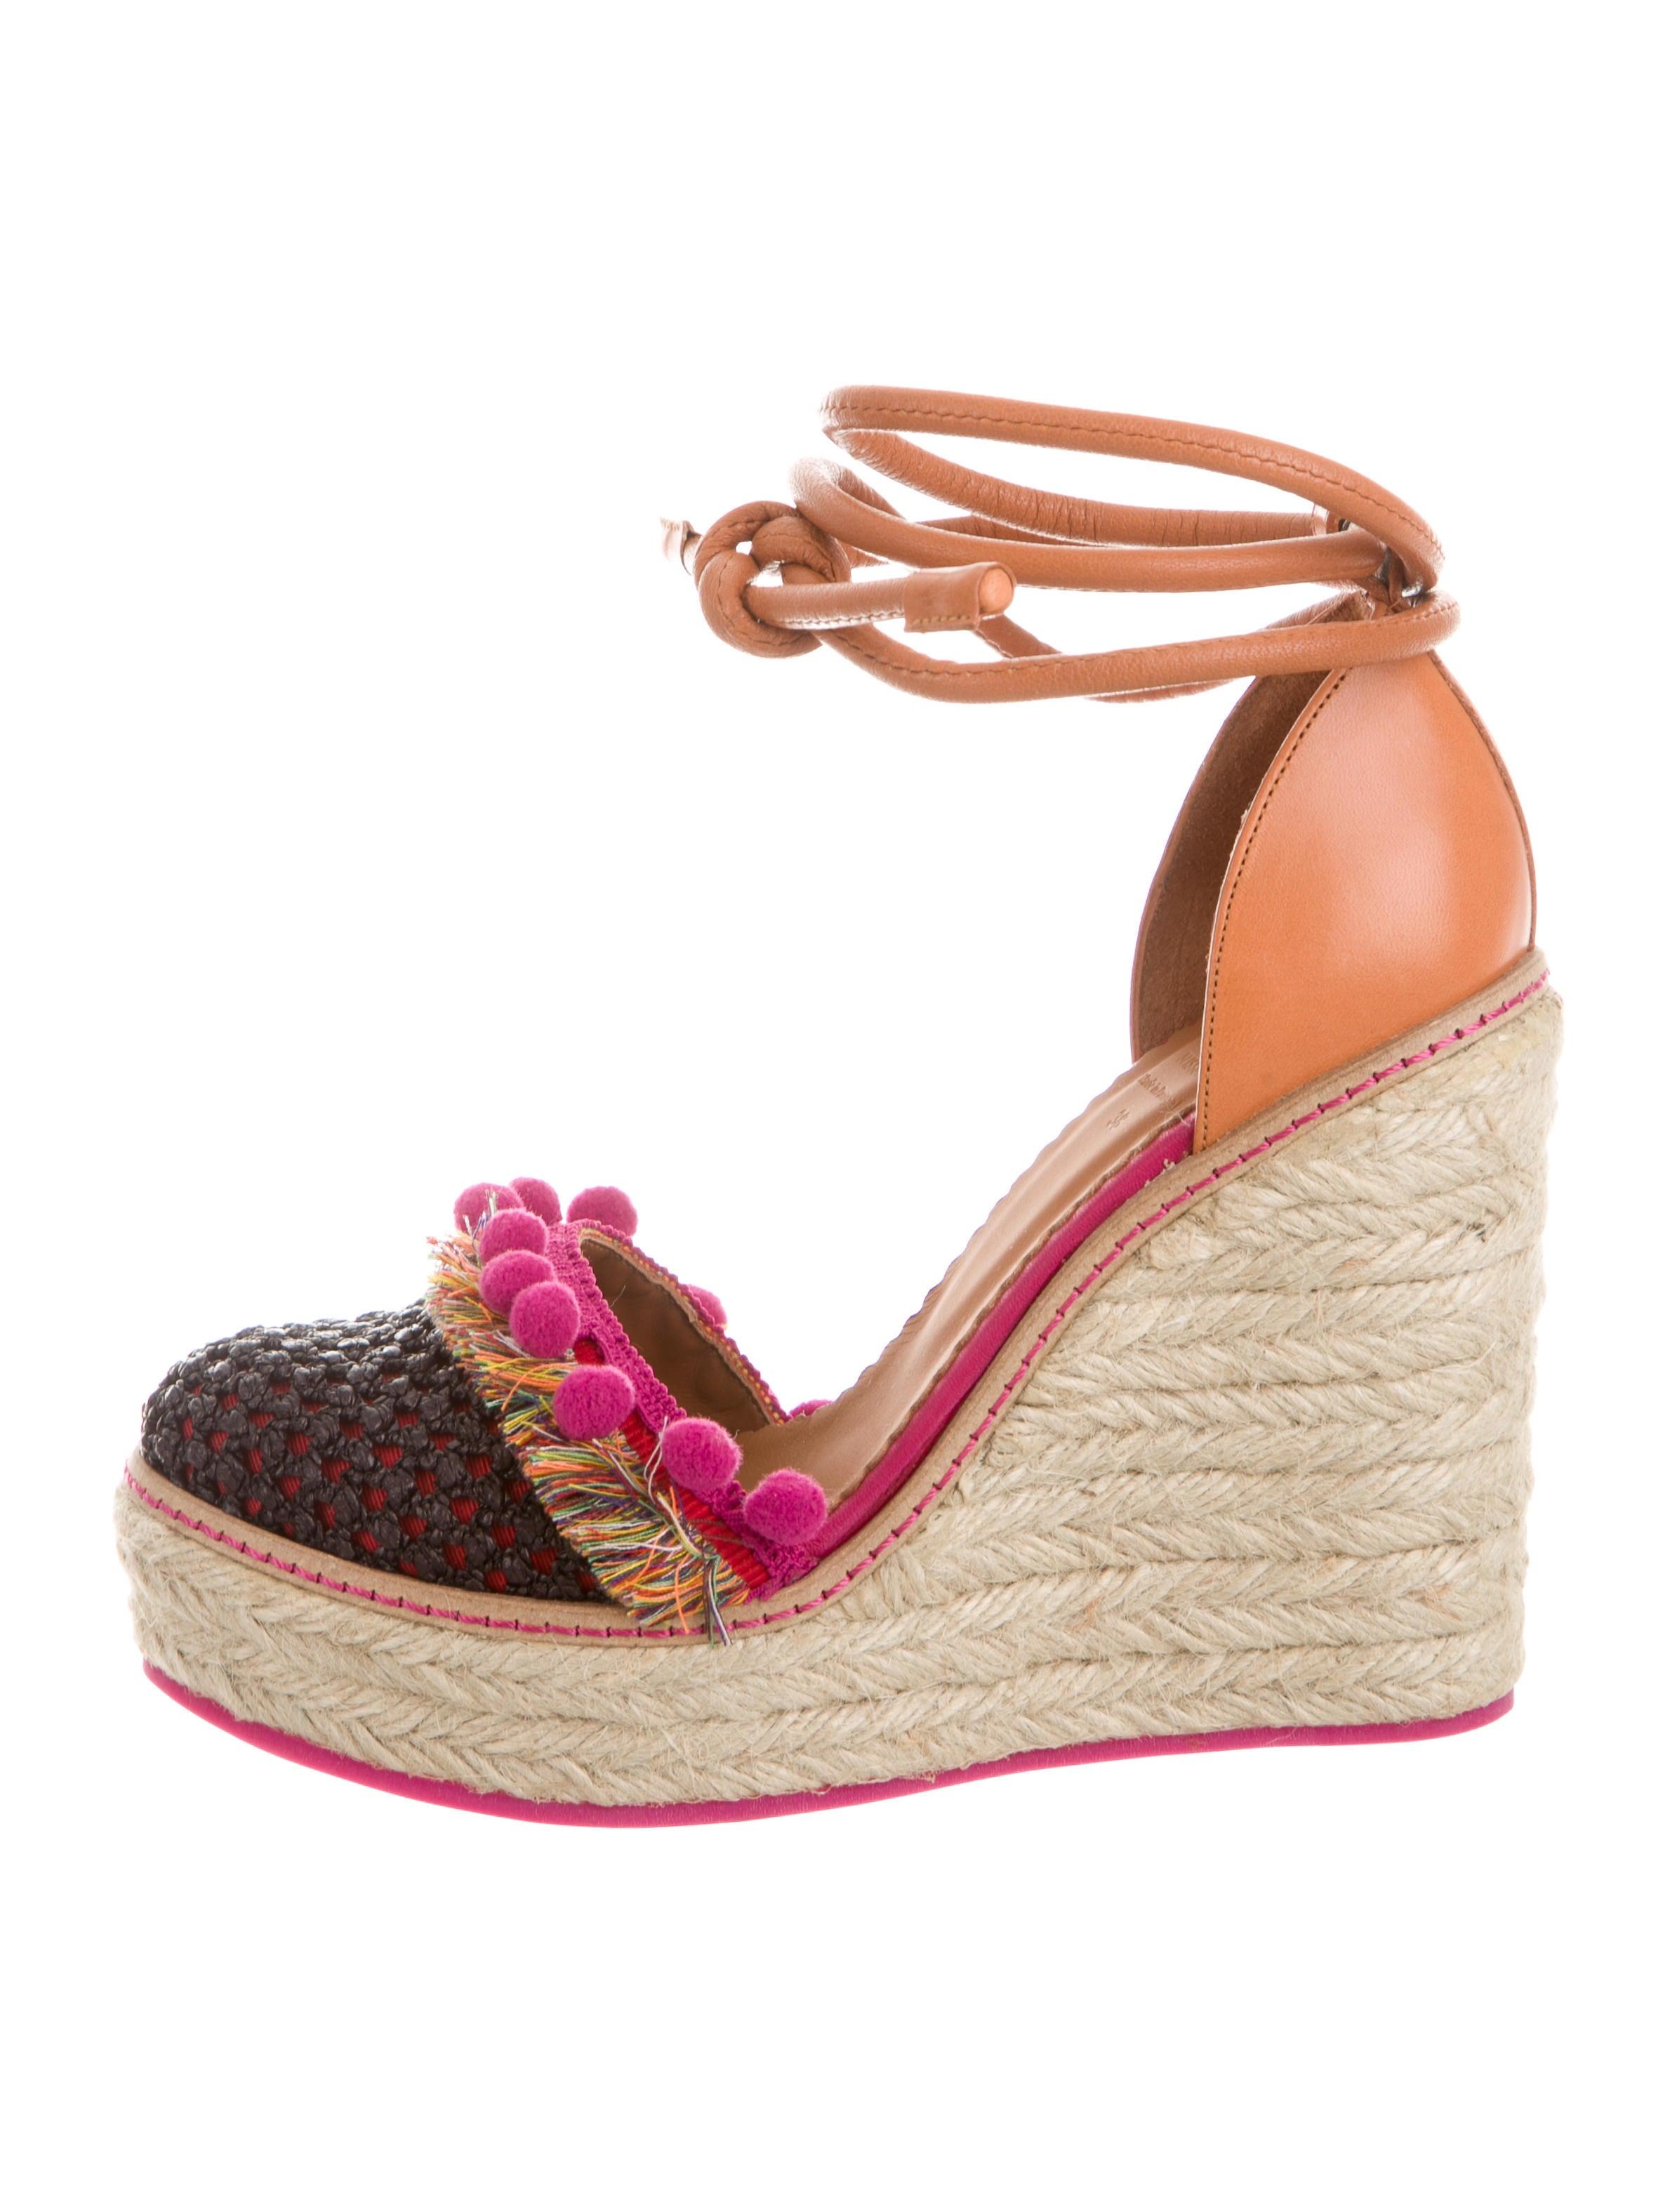 Missoni Platform Wedge Sandals w/ Tags buy cheap shop offer 8fyxd